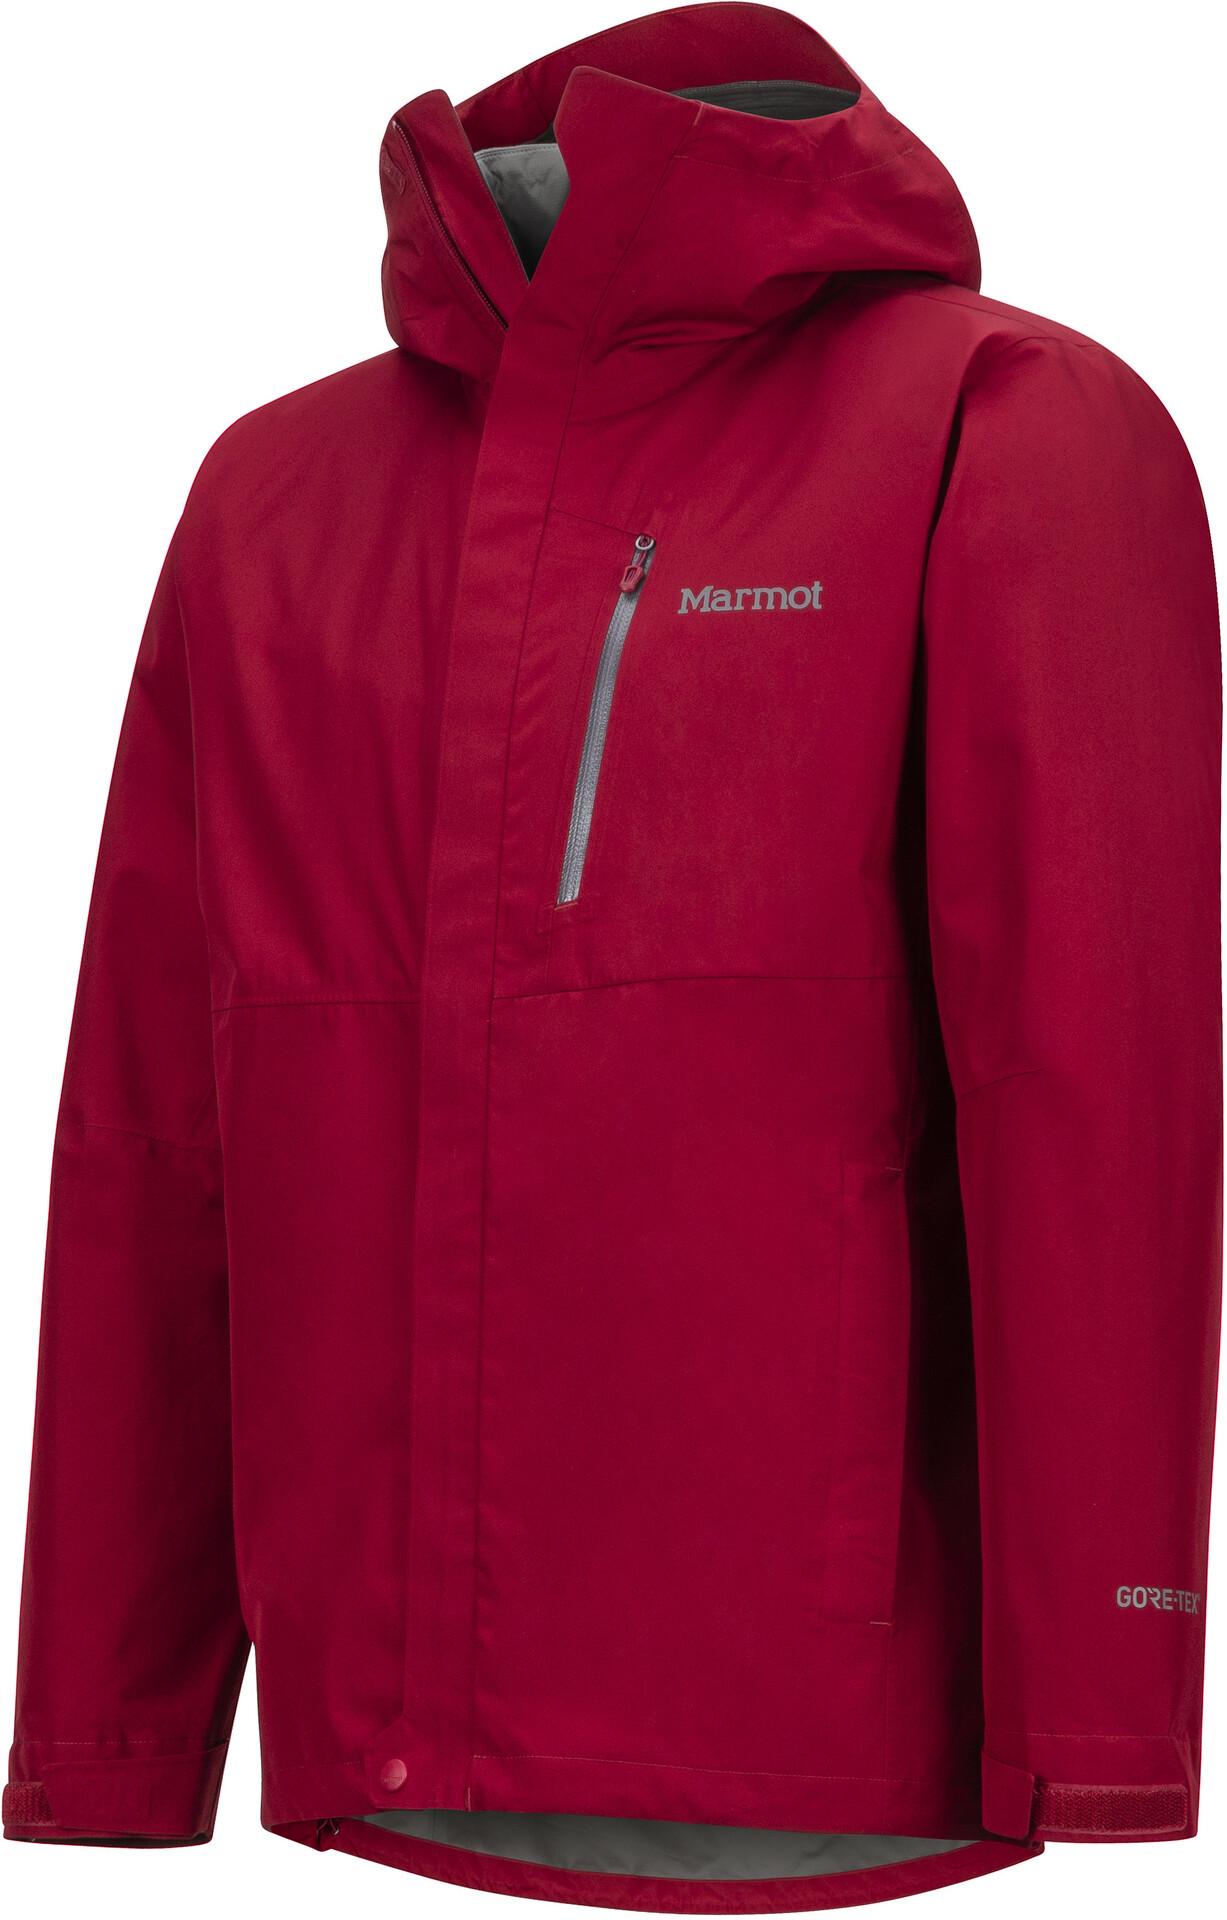 Marmot Childrens Minimalist Component Jacket